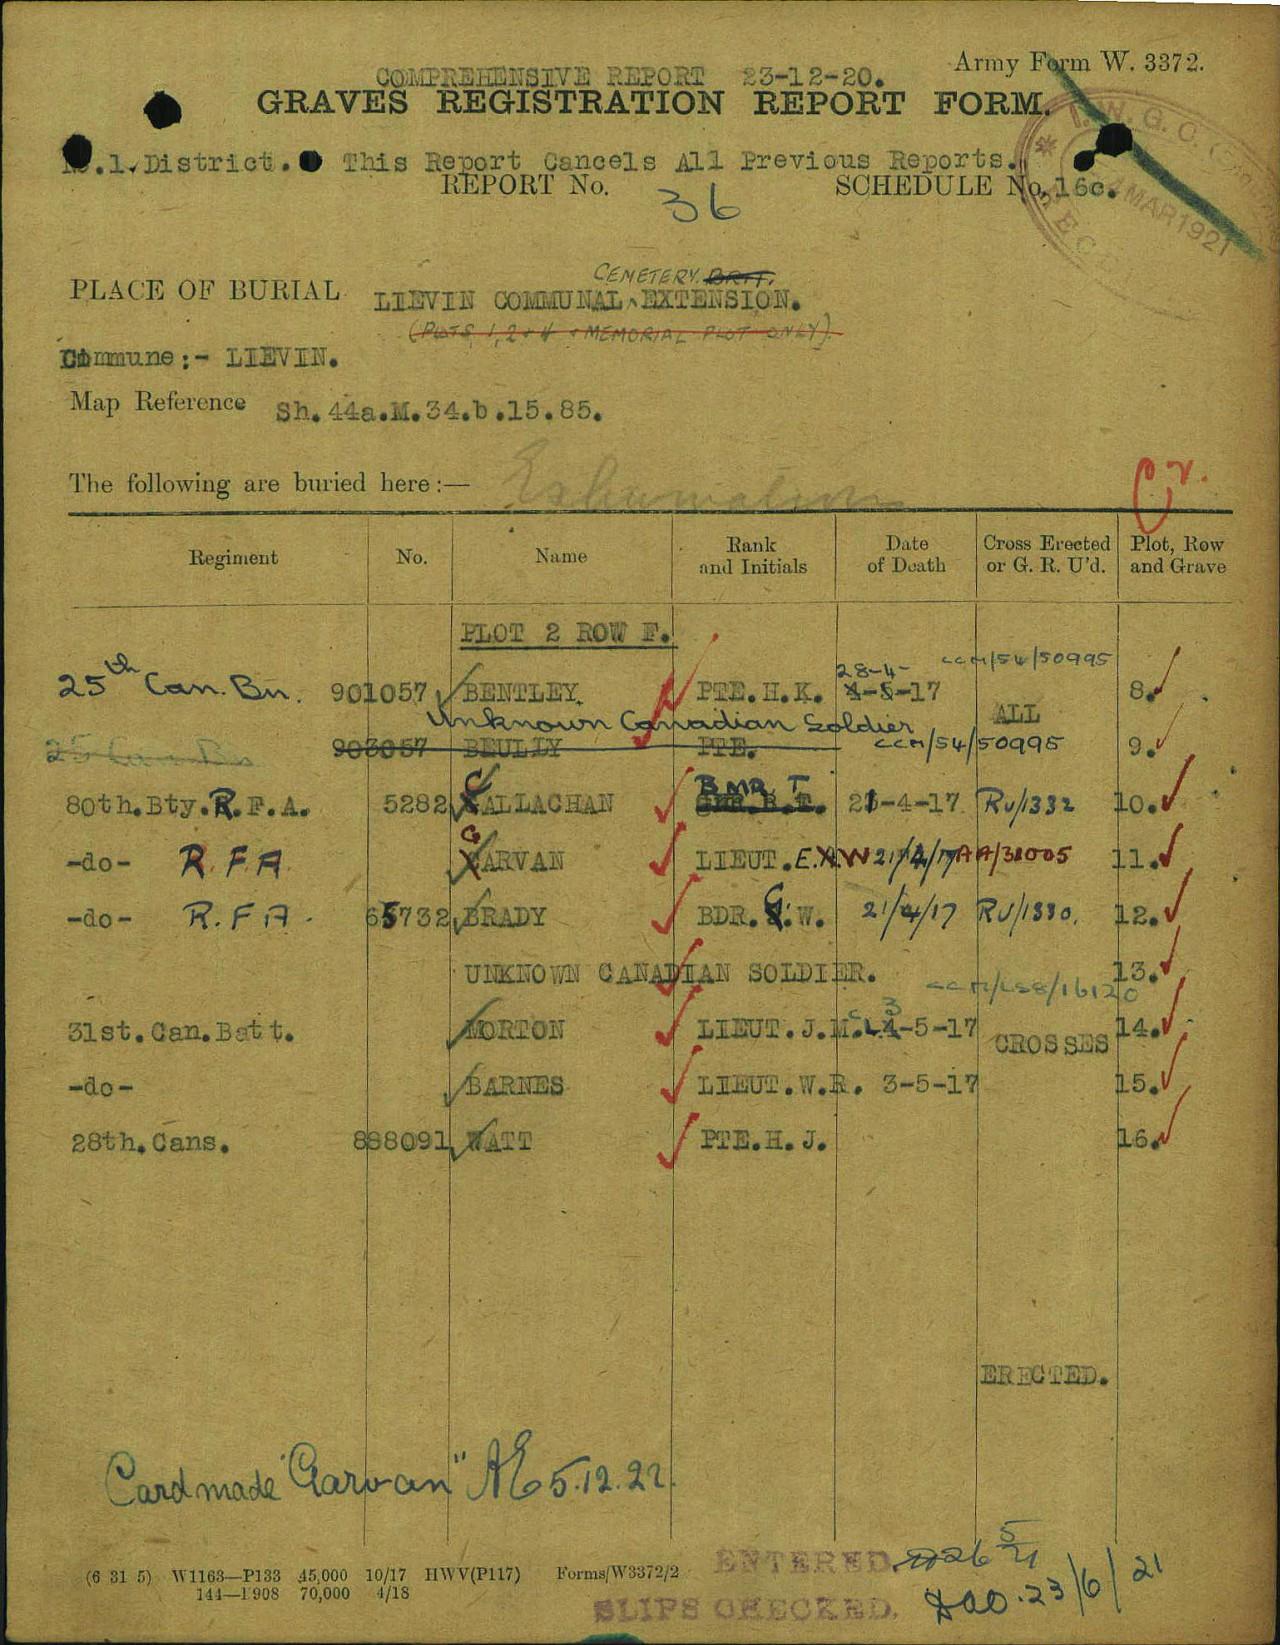 Graves registration form– Barnes, W. R. Lievin Graves Registration Report